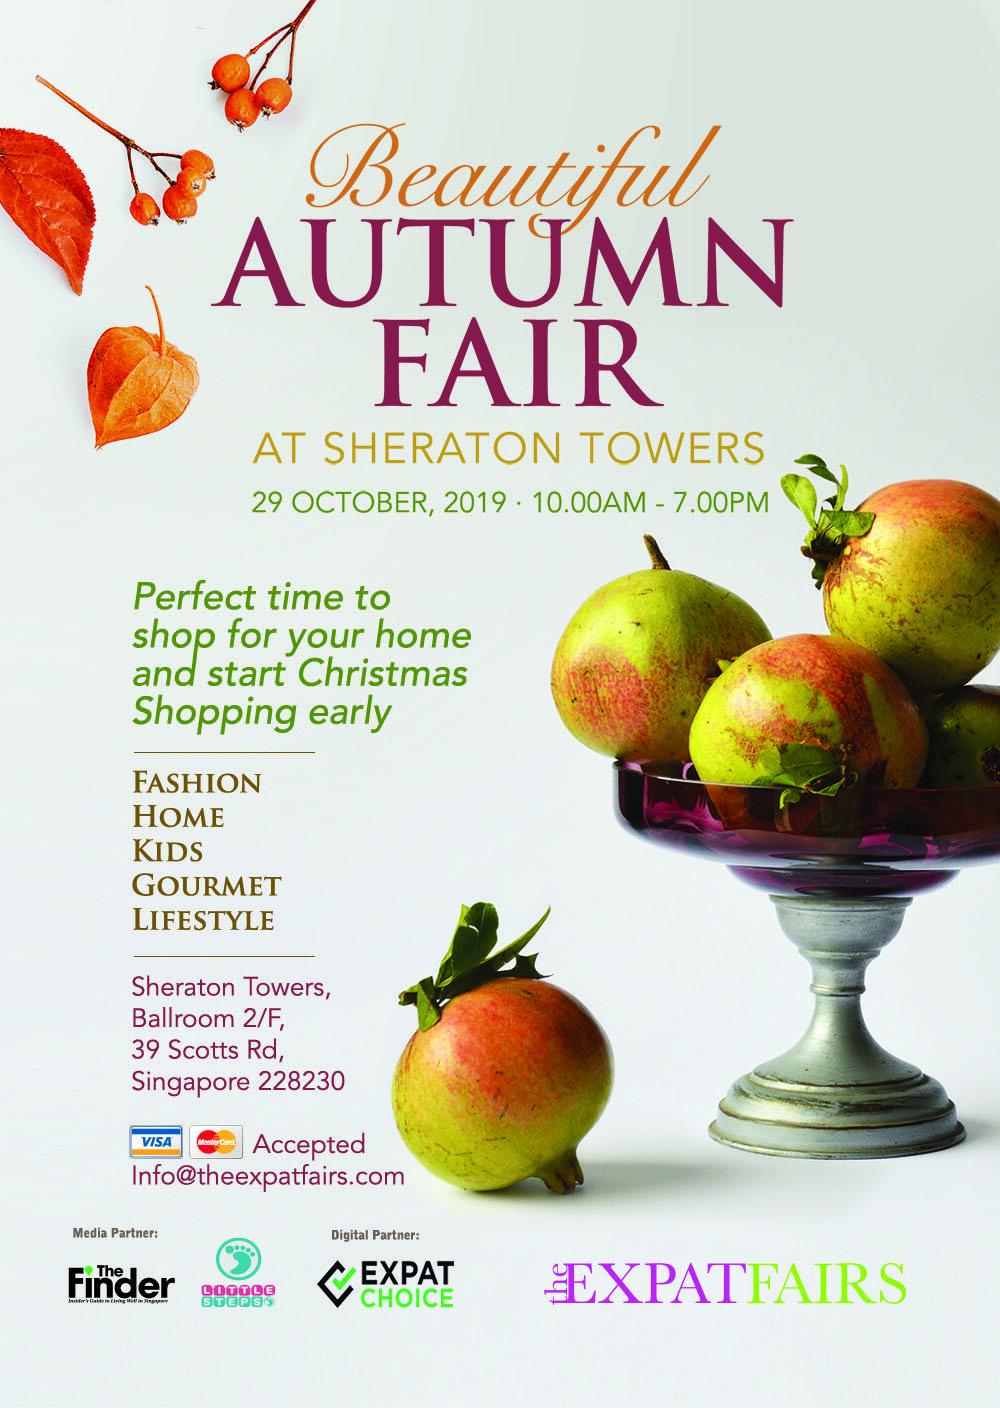 20191029 Expat Fairs Autumn Fair flyer.jpg